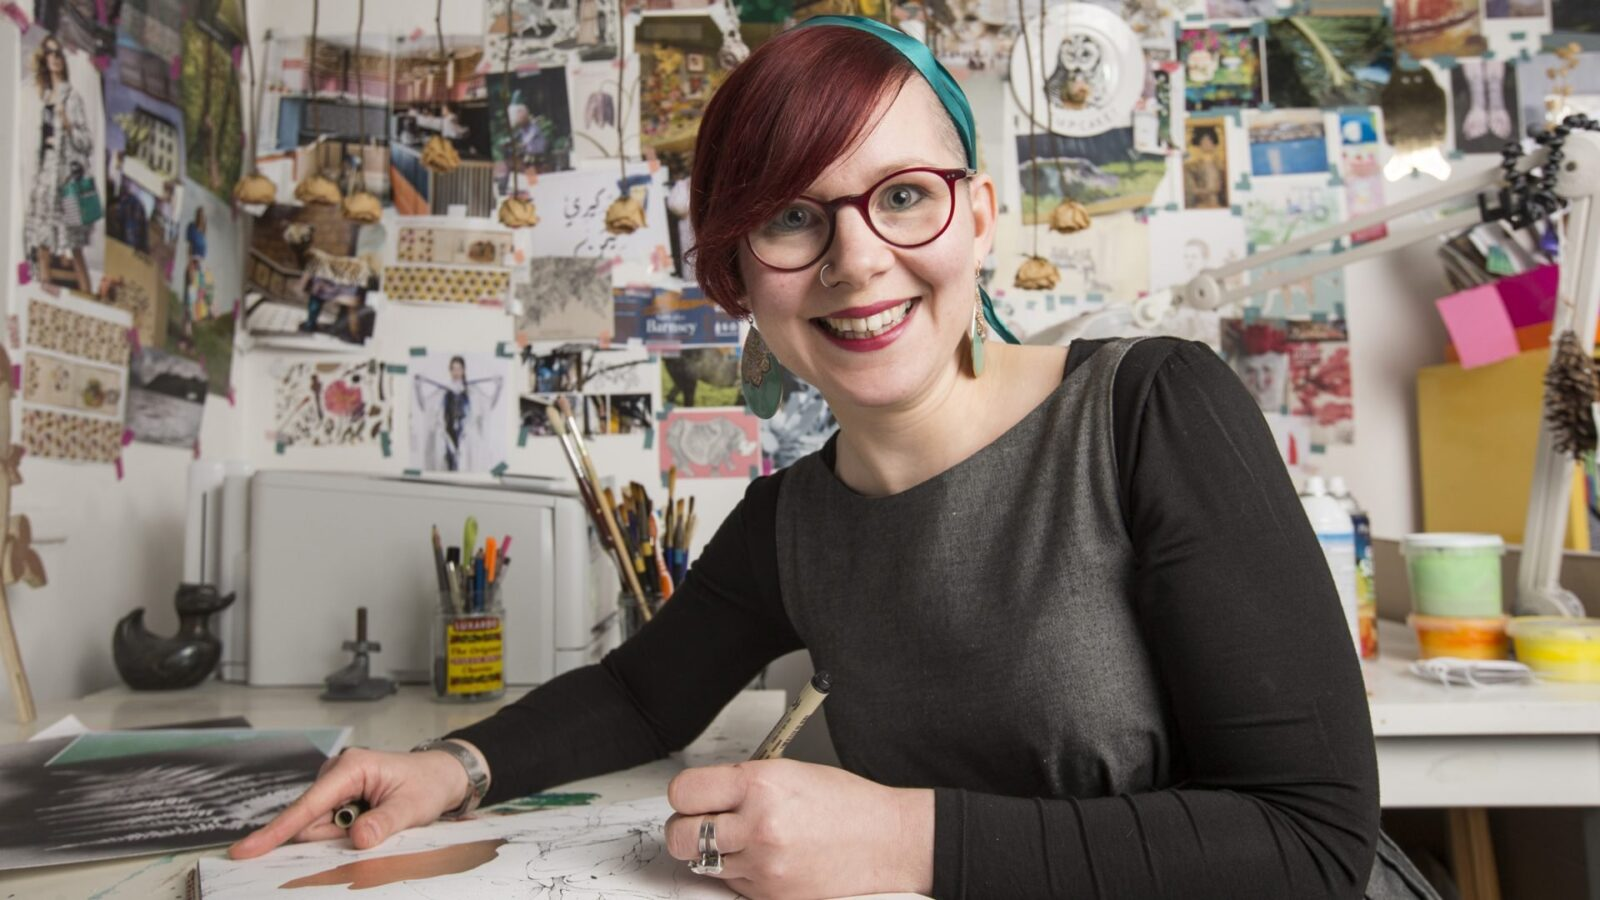 Kerry Lemon - Artistic inspiration from the artist du jour